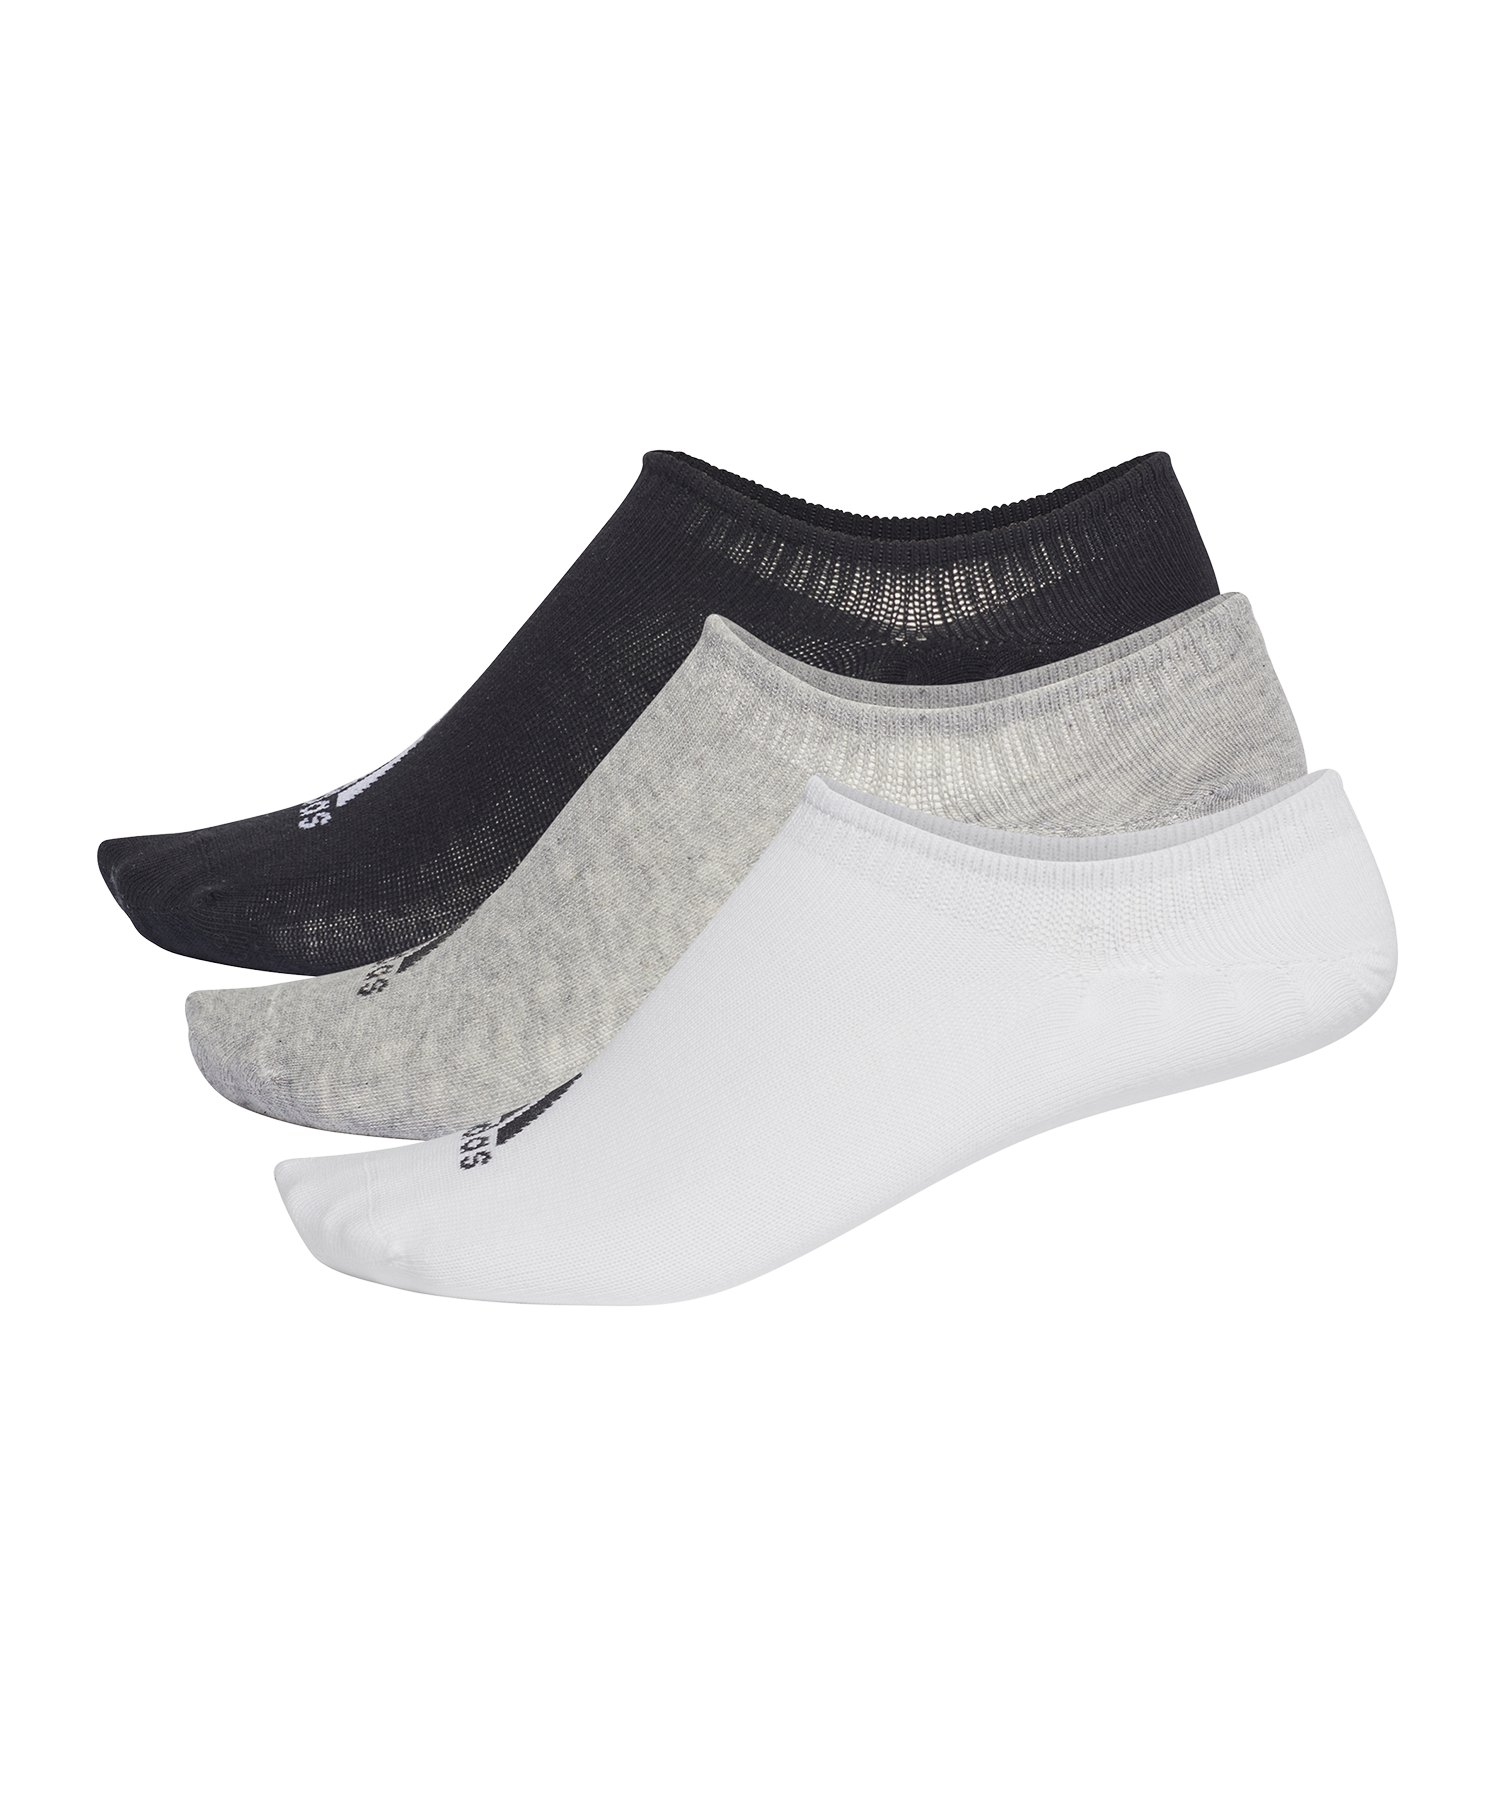 adidas Performance Invisible Socken 3 Paar Grau Weiss Schwarz - grau